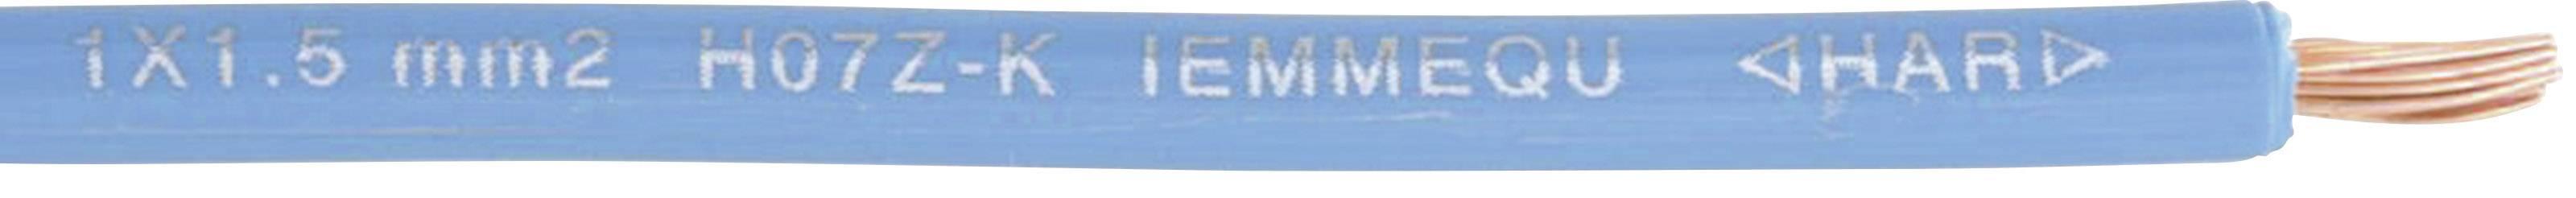 Opletenie / lanko Faber Kabel 040271 H07Z-K, 1 x 2.50 mm², vonkajší Ø 3.80 mm, 100 m, svetlomodrá